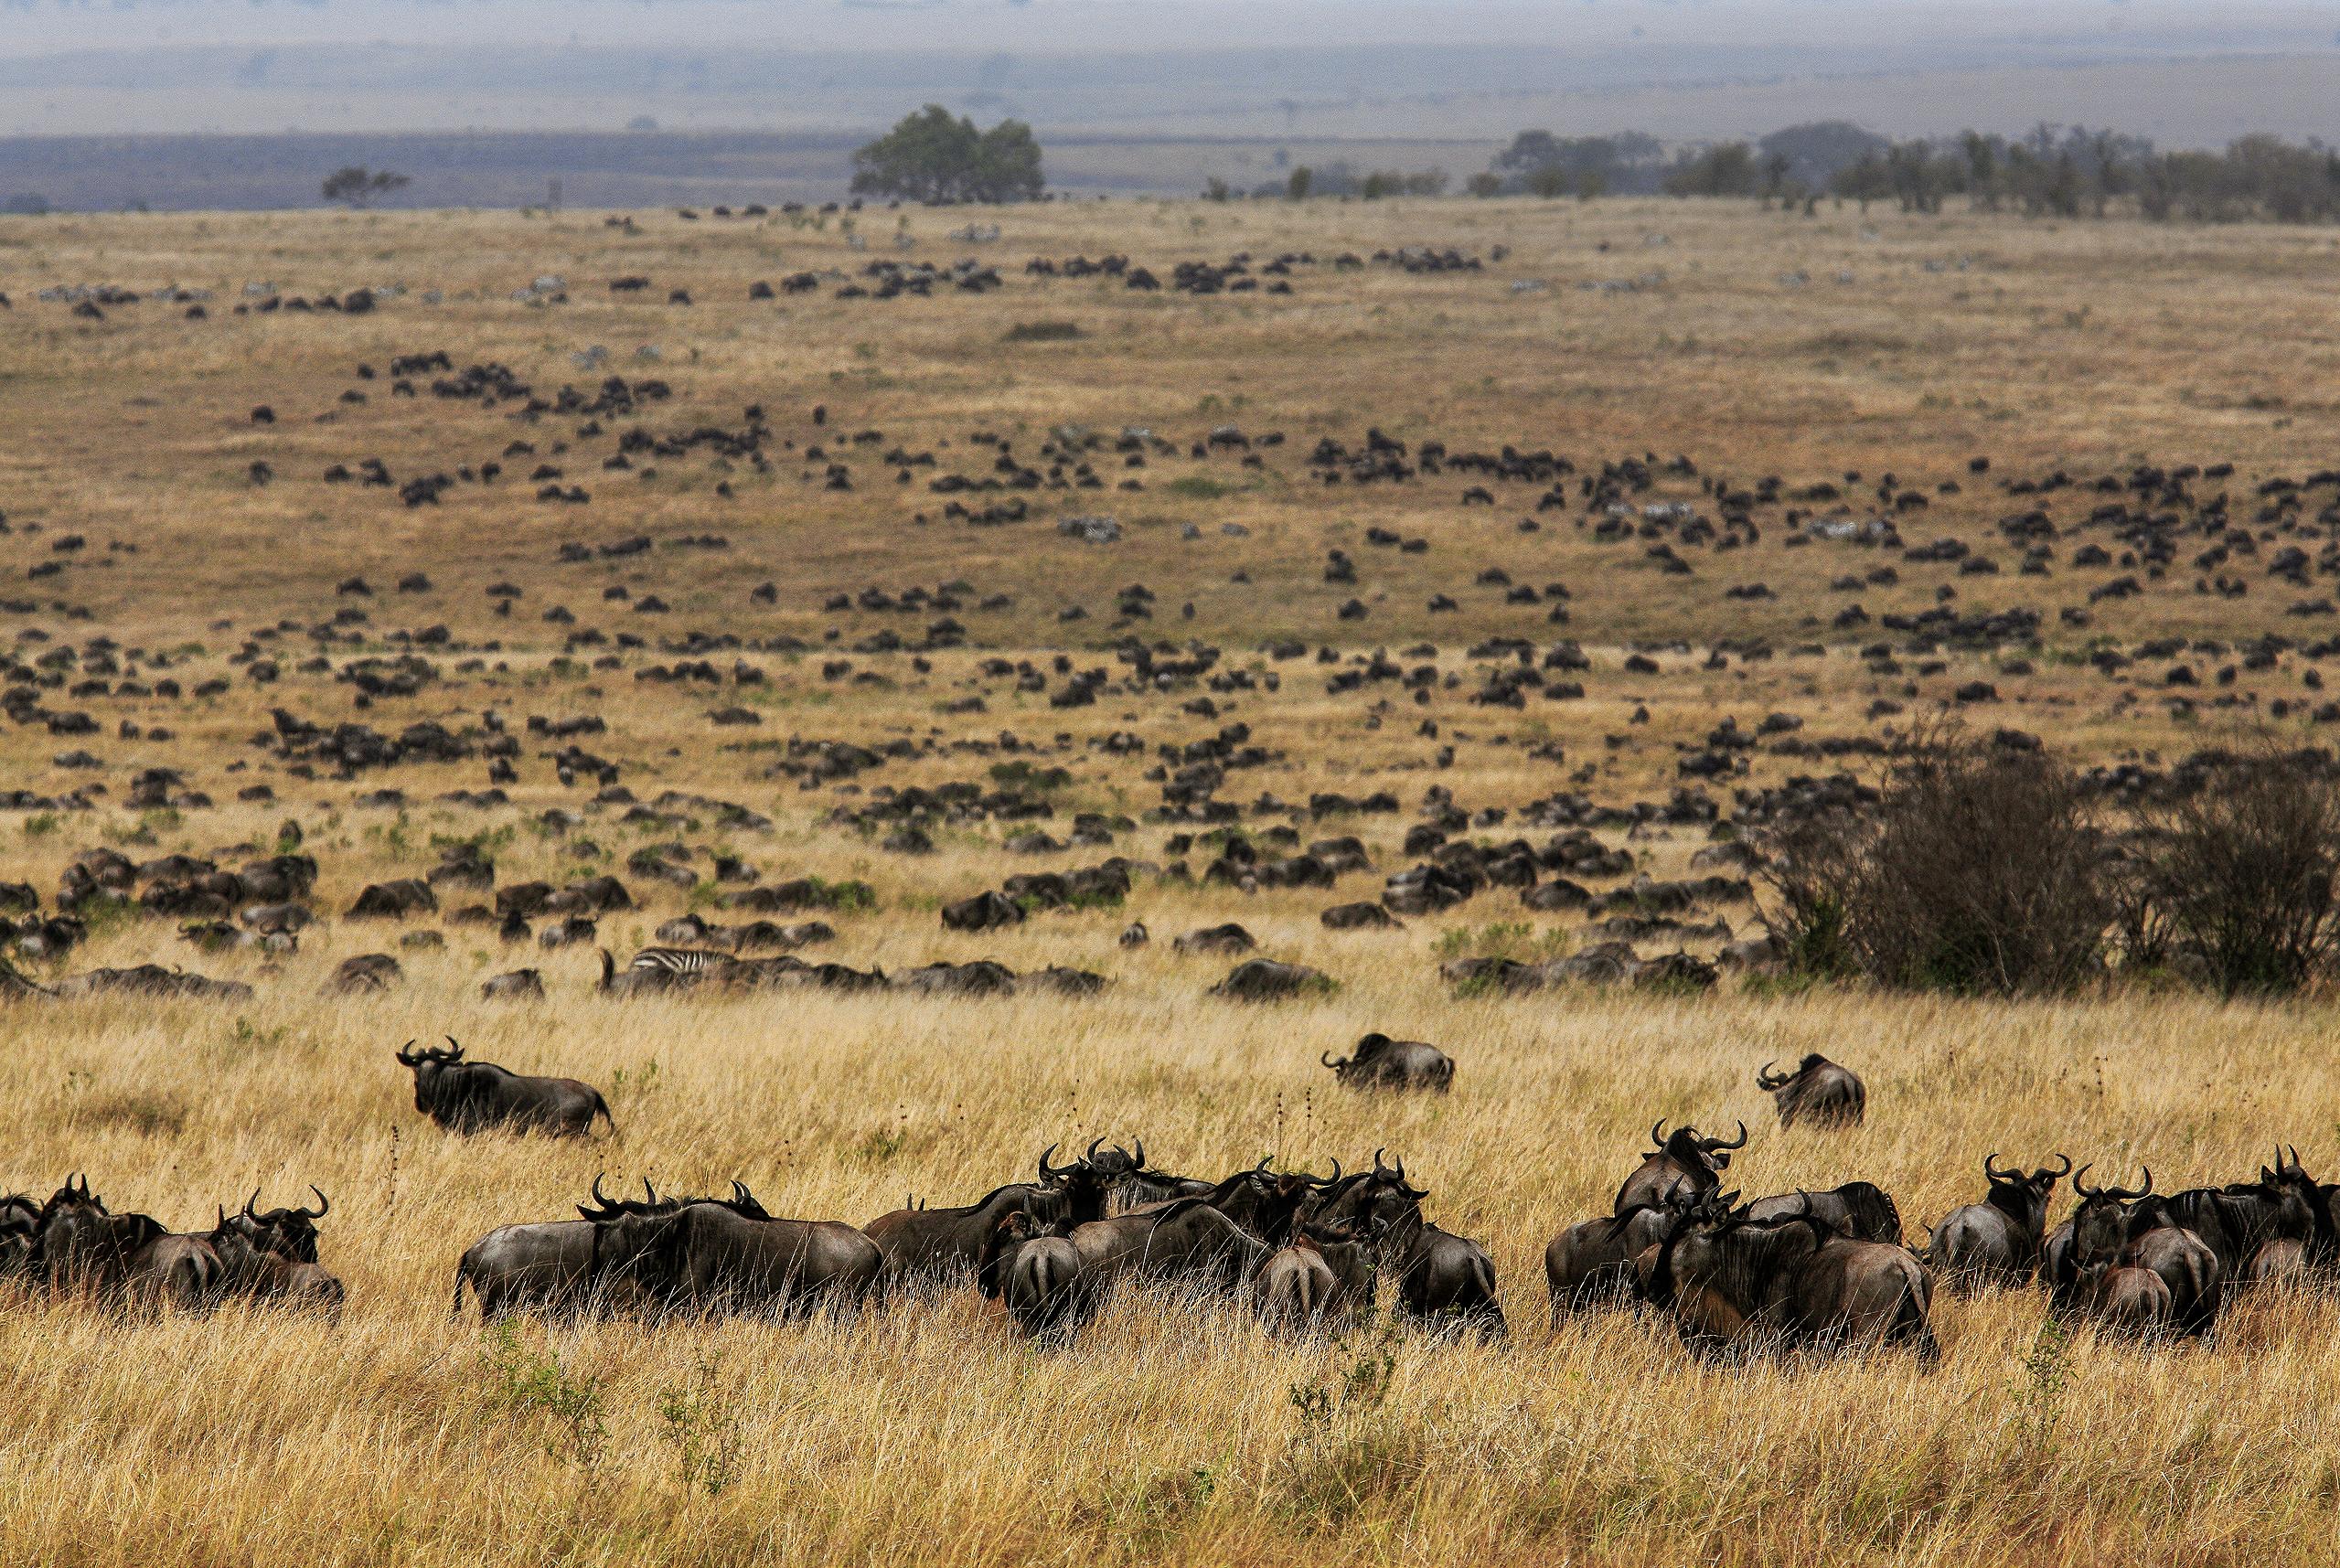 roaring_rain_lions_masai_mara_photo_by_flavio_oliva_26